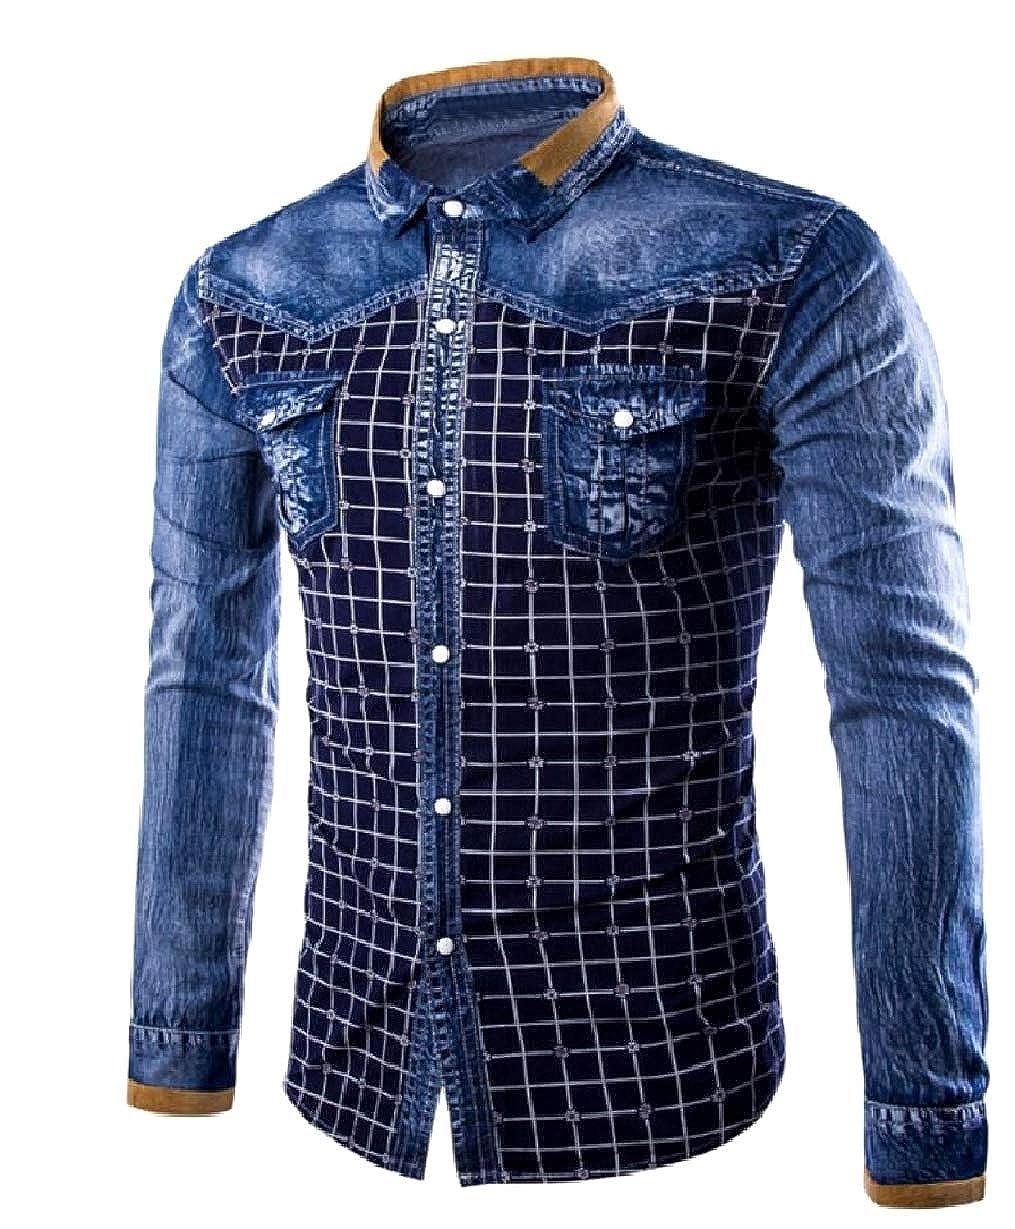 Mfasica Mens Relaxed Denim Buttoned Front Long Sleeve Shirt Tops